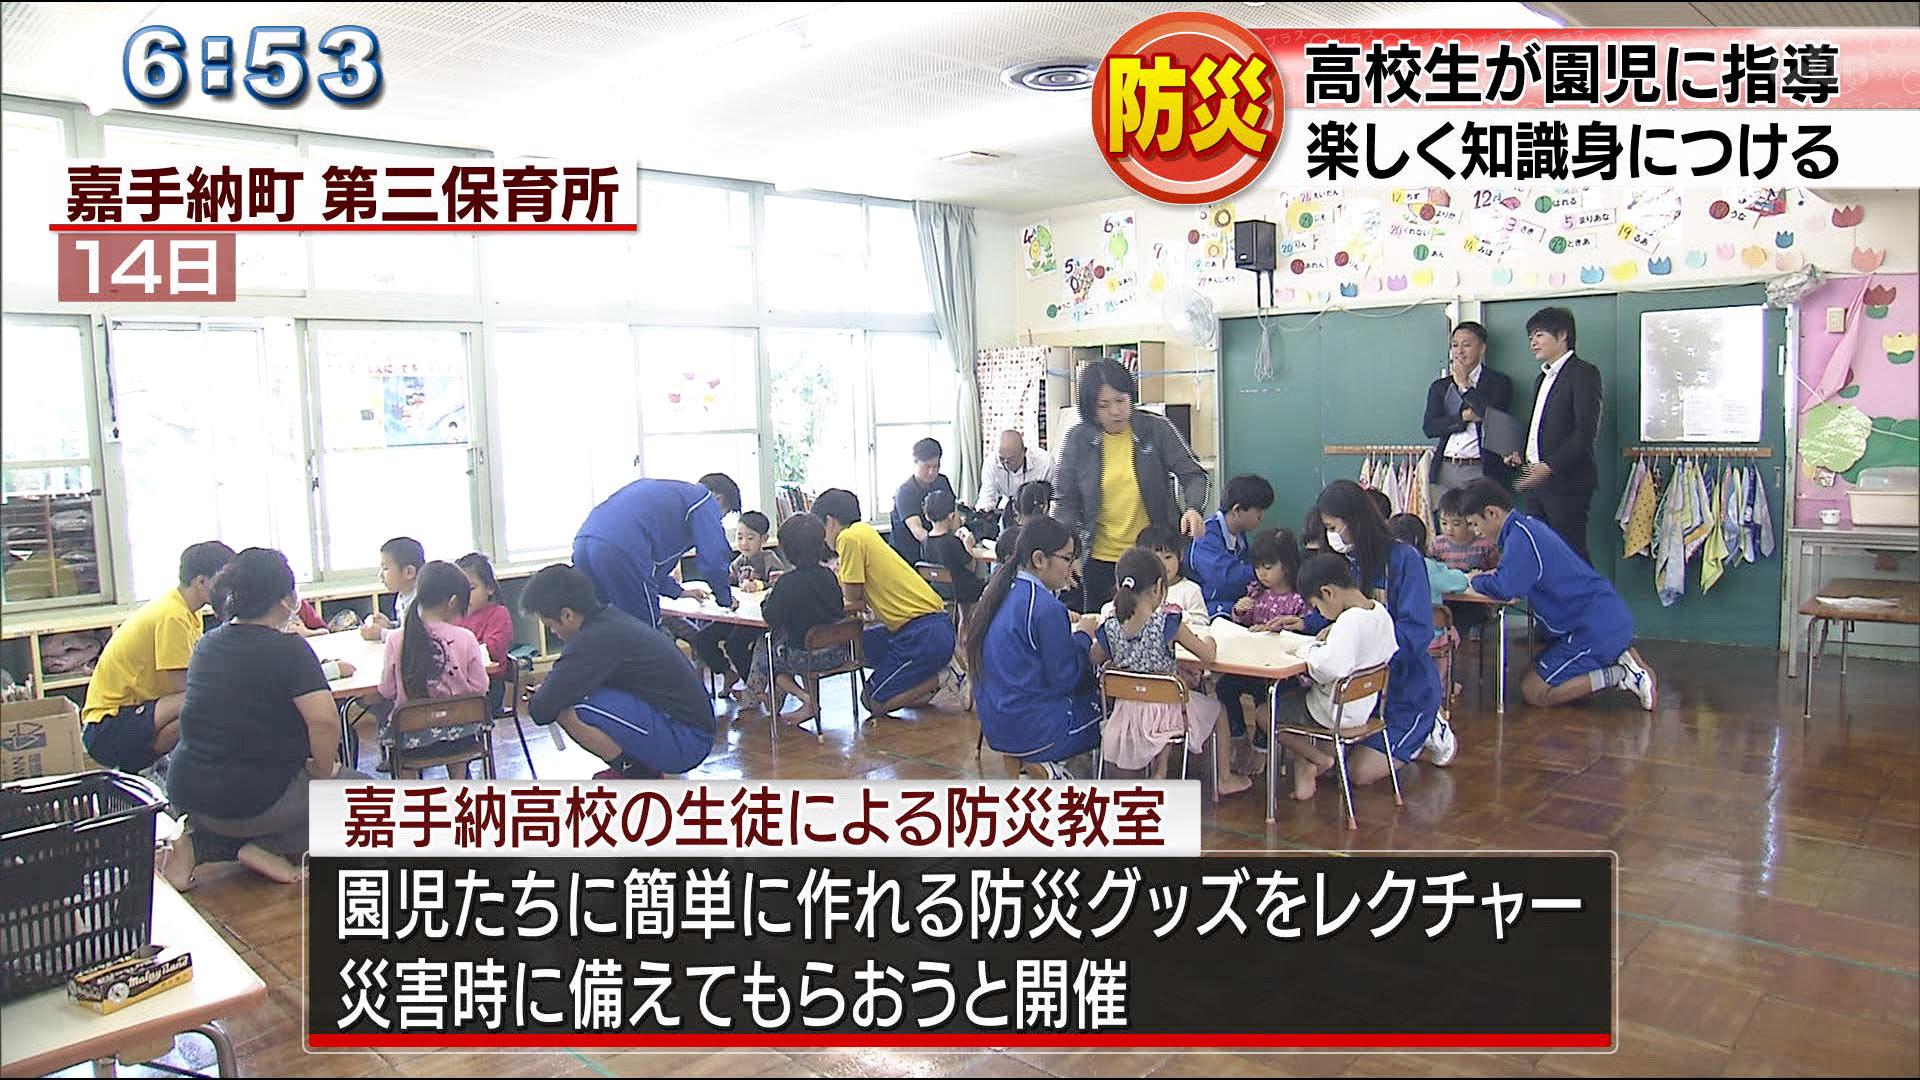 嘉手納高校生が園児に防災教室